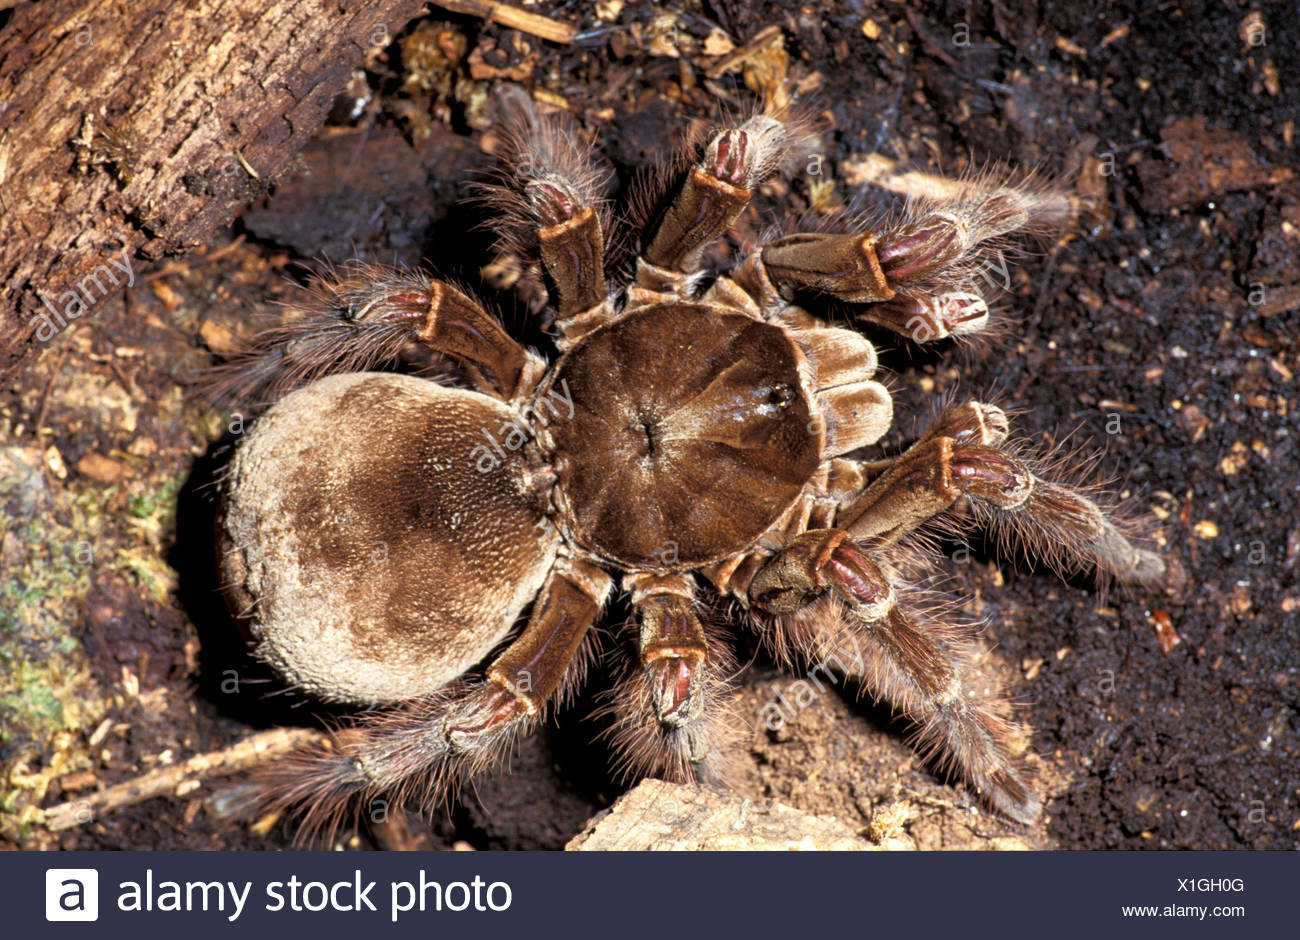 Goliath Bird Eating Spider Theraphosa Blondi Captive